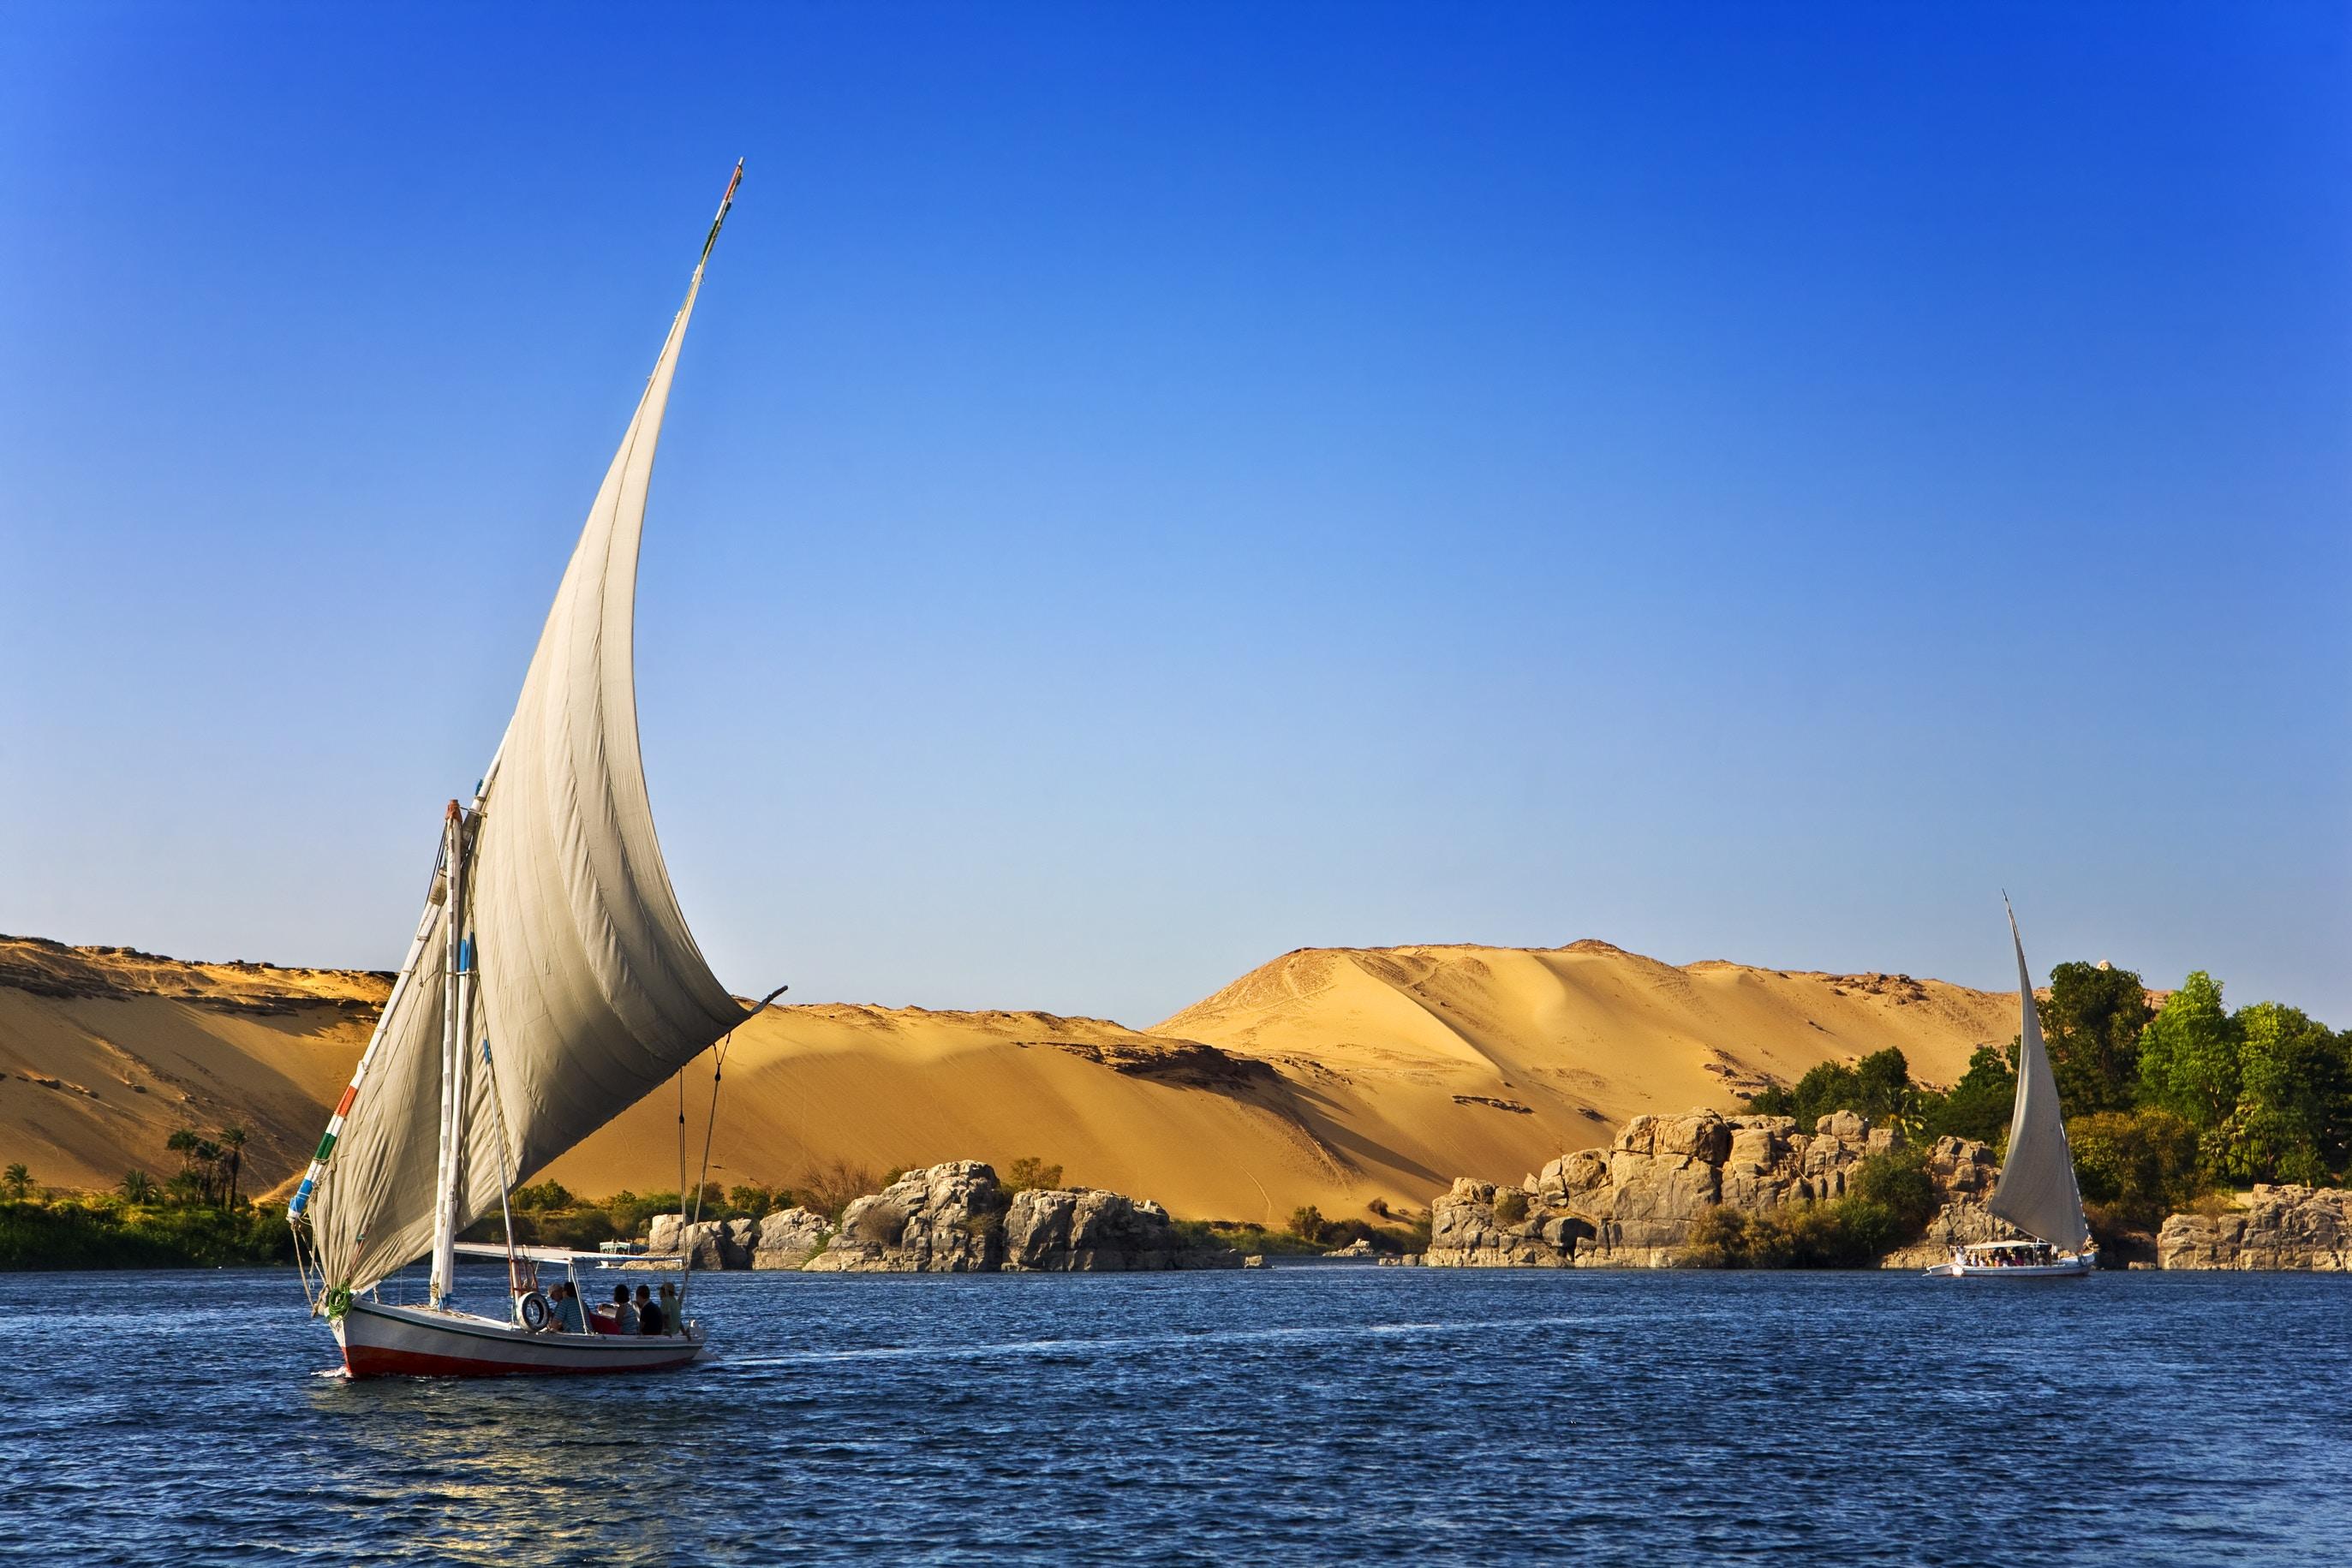 EGYPTE : CROISIERE SUR LE NIL A BORD DU DAHABIYA DELUXE QUEEN TIY 08 JOURS / 07 NUITS